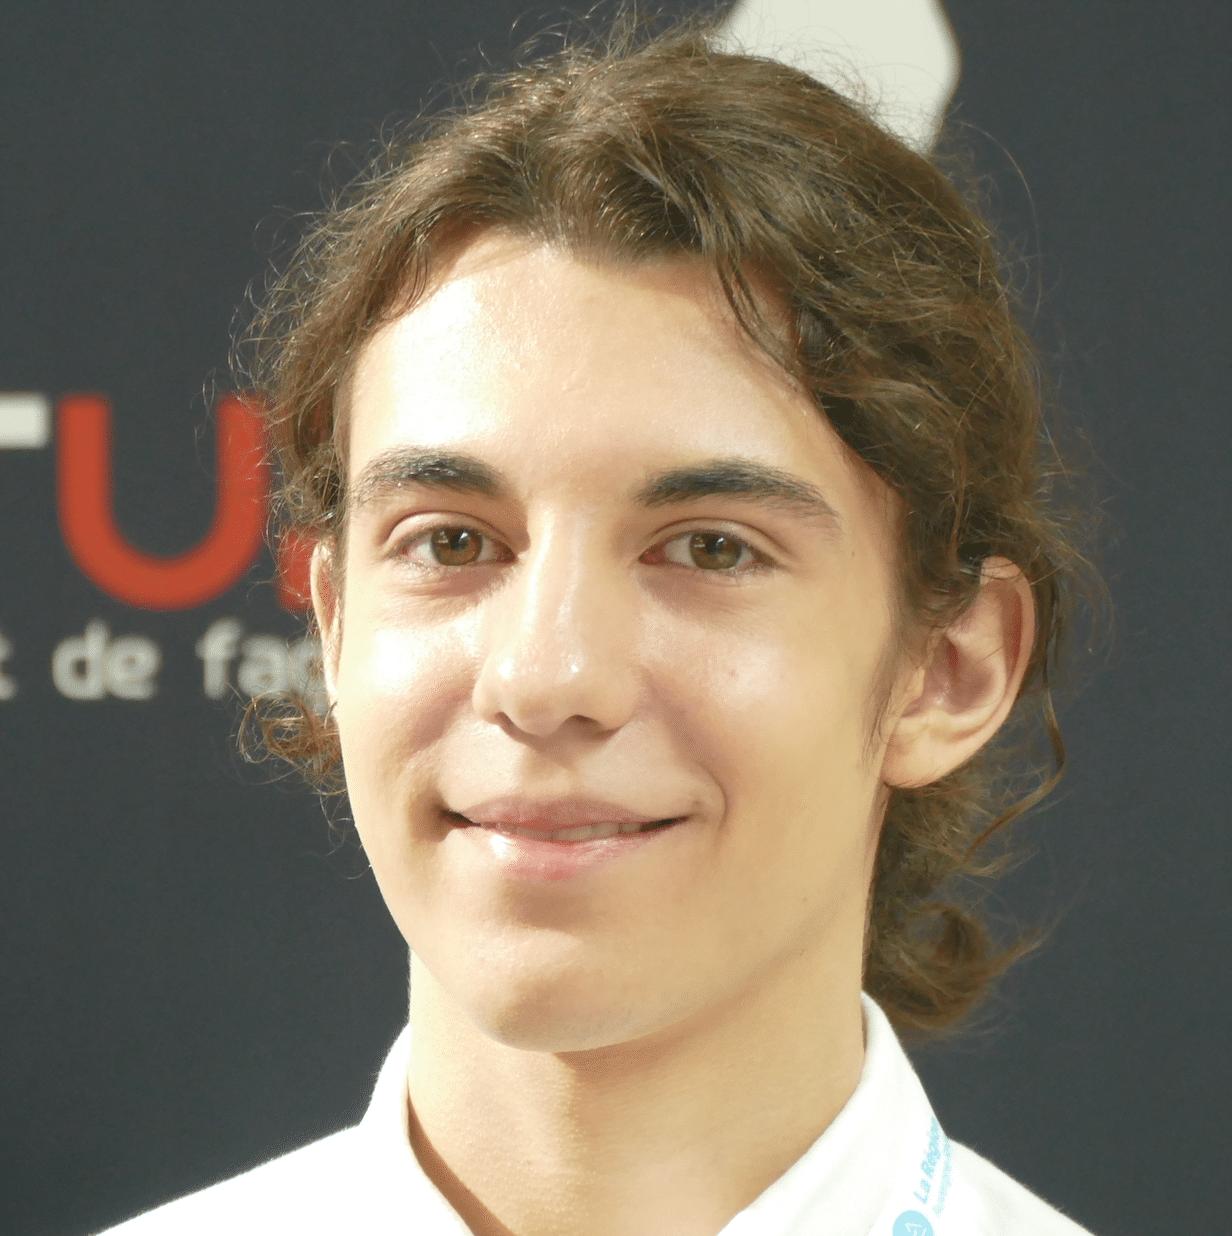 Bastien Bras de Fer